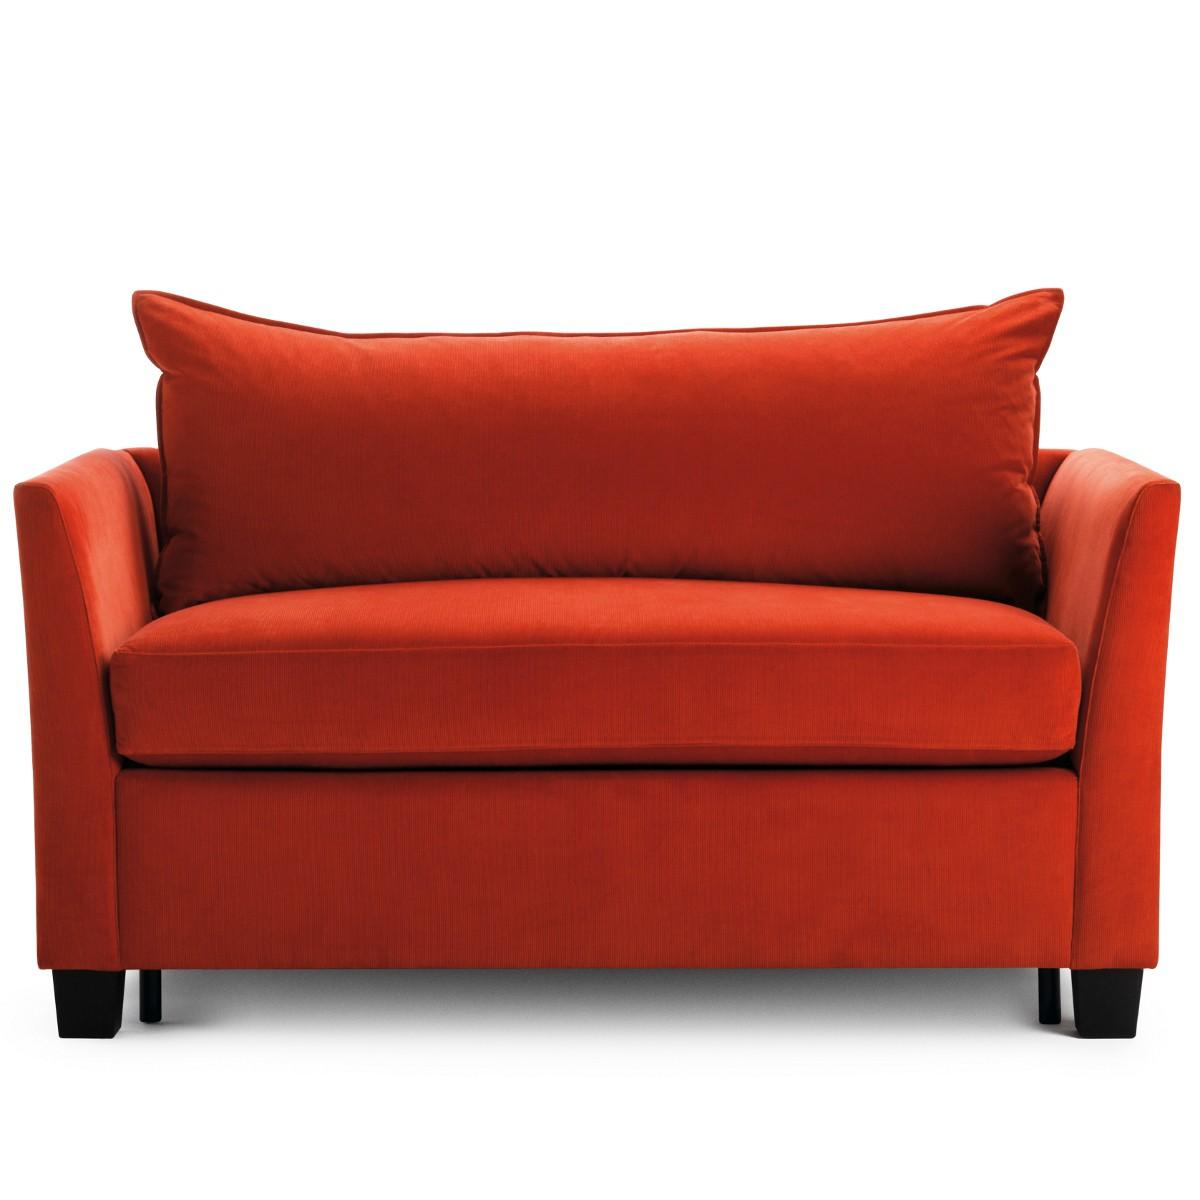 Himolla canap s et fauteuils relax art volume design for Canape himolla